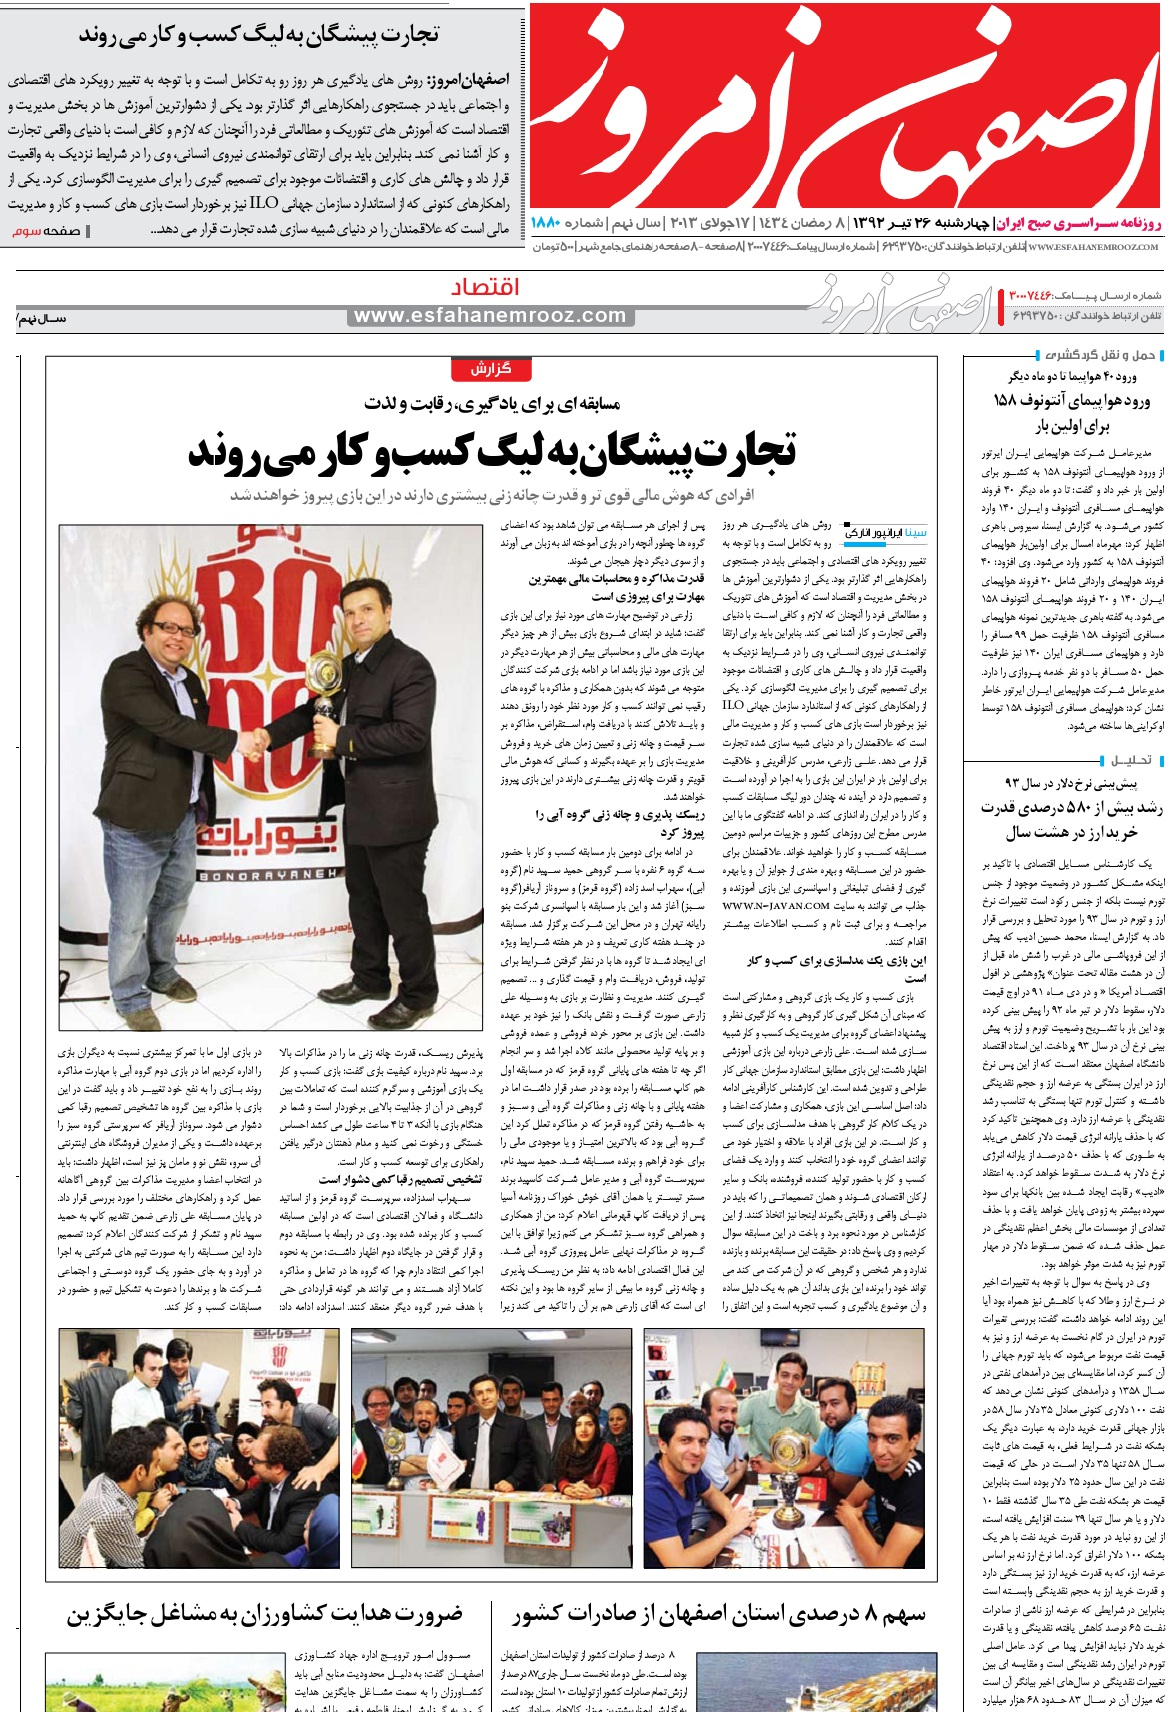 http://www.n-javan.com/bazi-karafarini/karafarini-game2/esfahanemrooz-aks.jpg